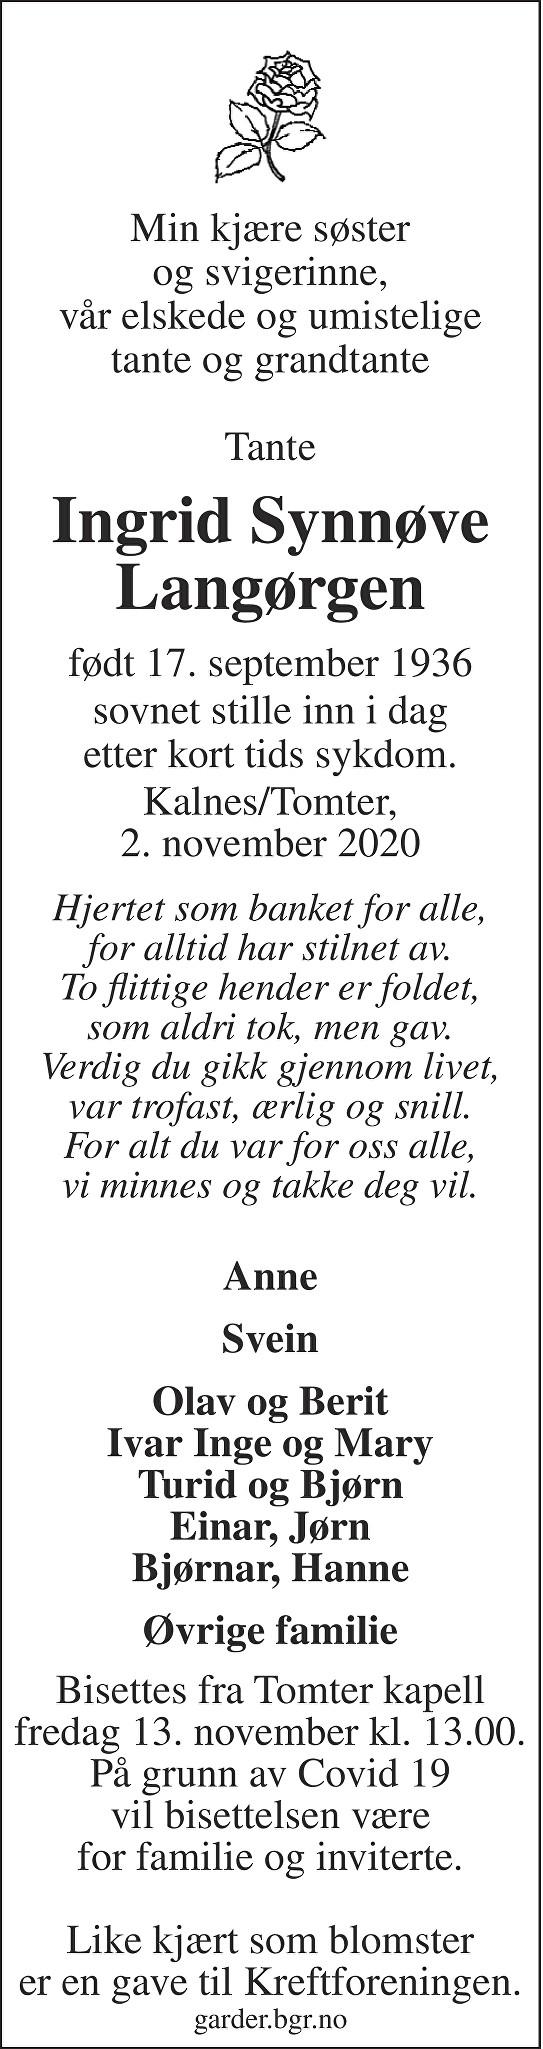 Ingrid Synnøve Langørgen Dødsannonse